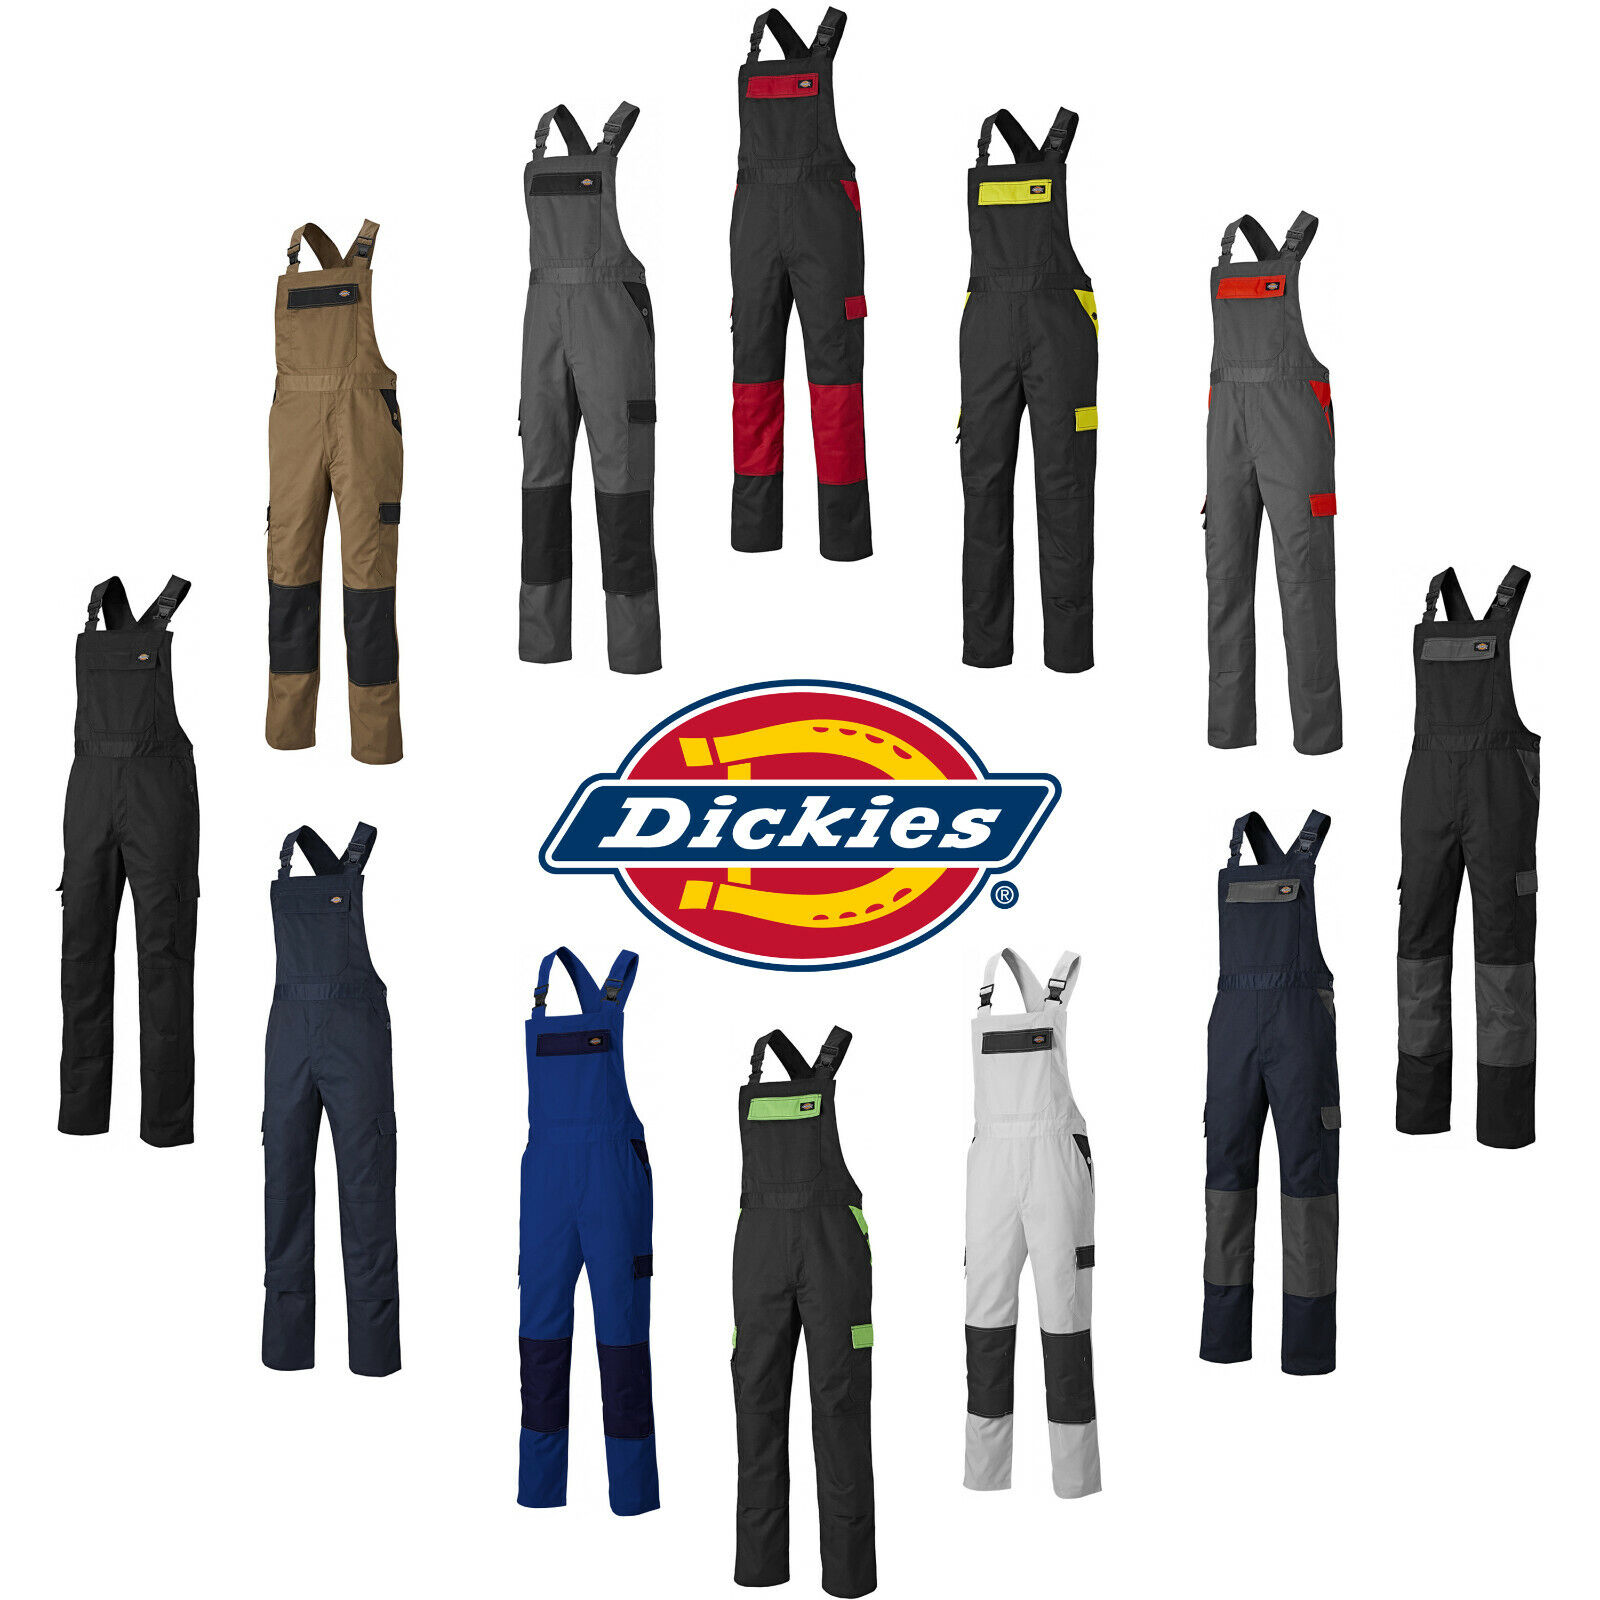 Dickies Everyday Bib /& Brace Multiple Poche Combinaison Bleu marine//gris toutes tailles